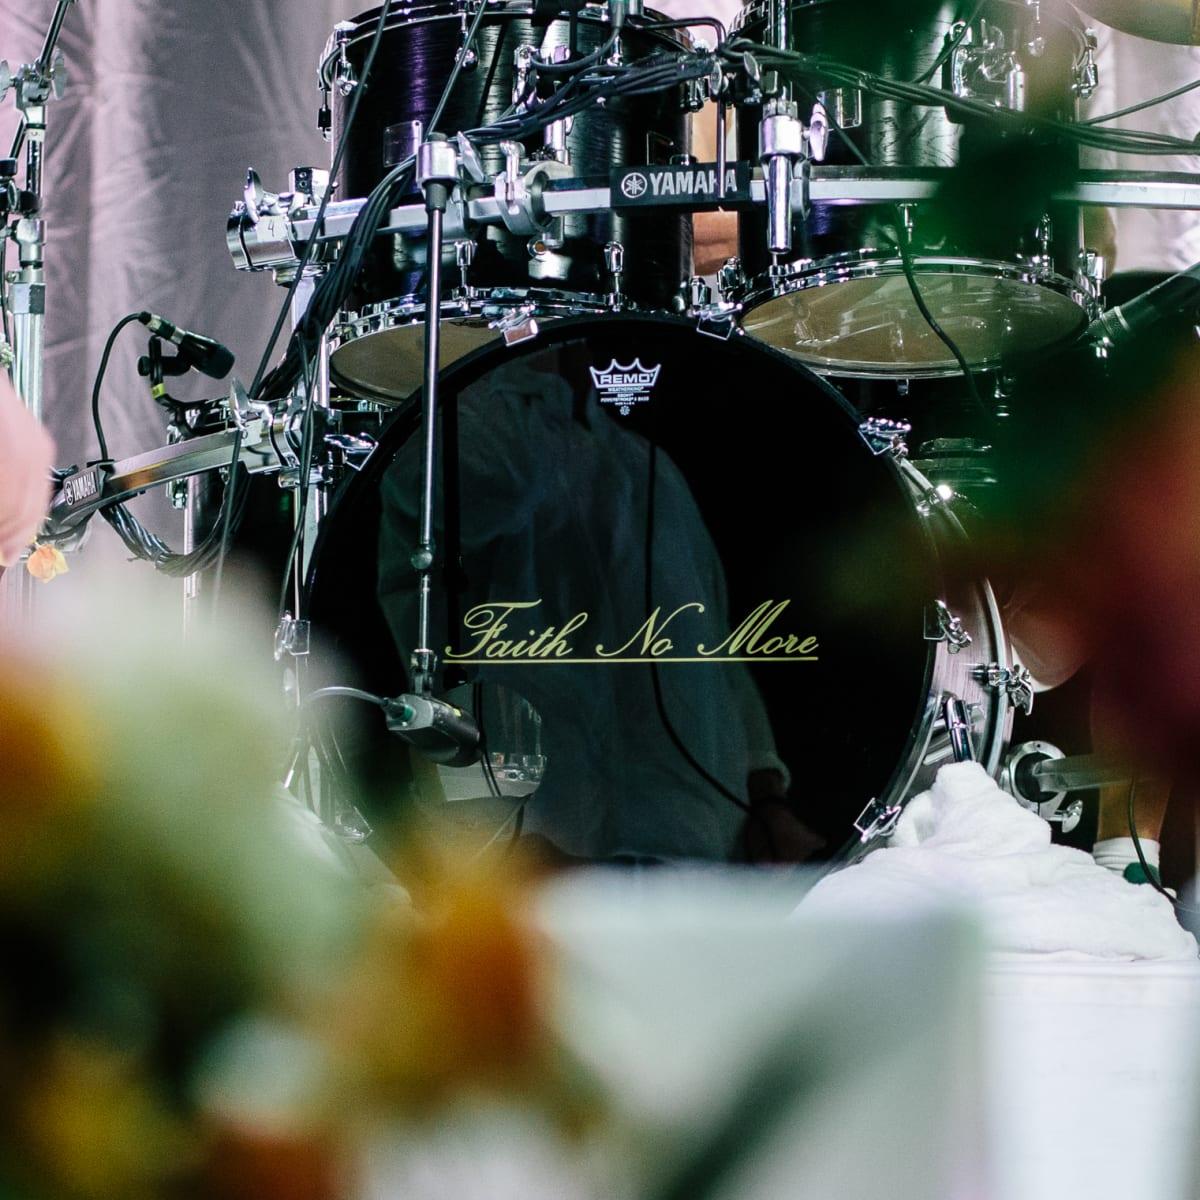 Faith No More at Austin Music Hall July 2015